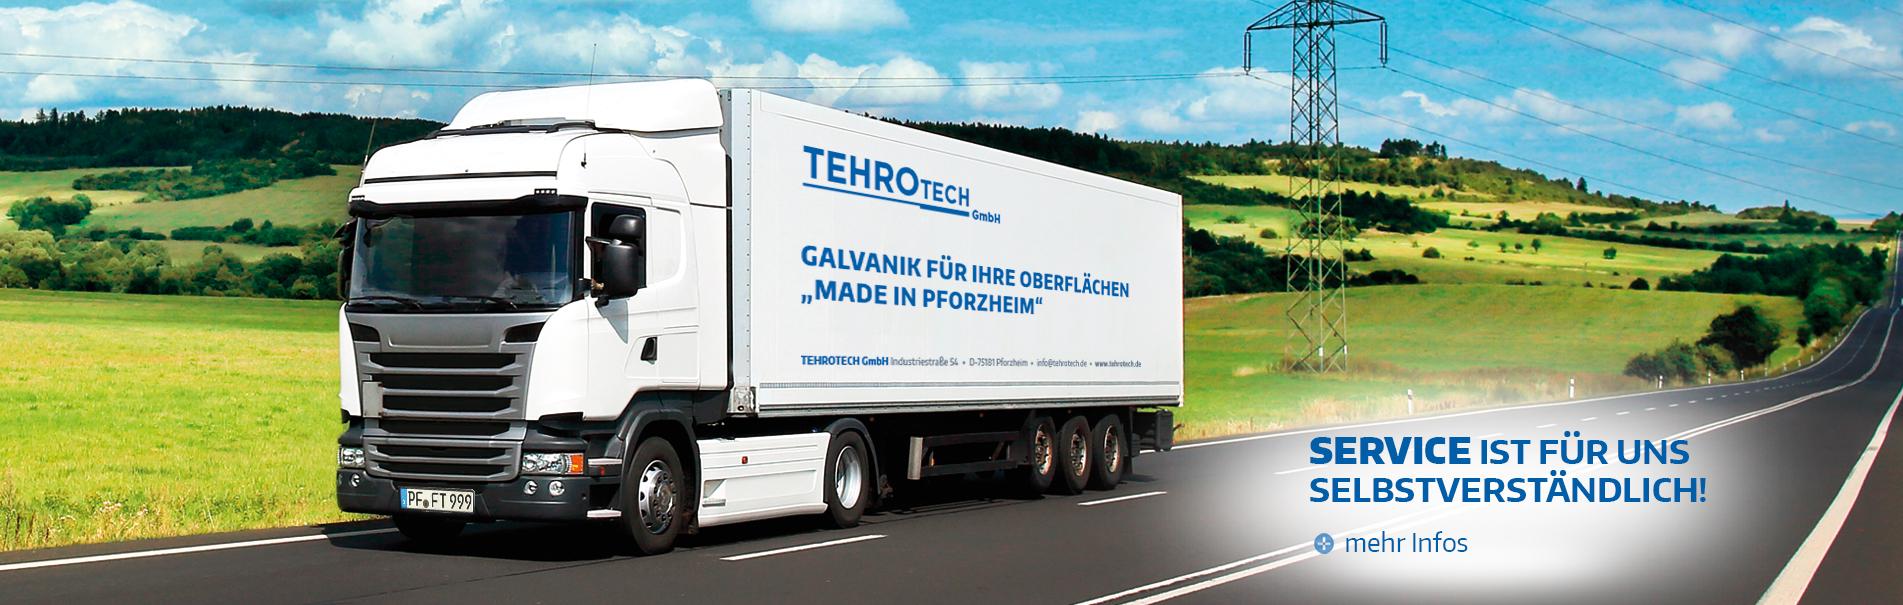 Tehrotech GmbH – Service und Beratung